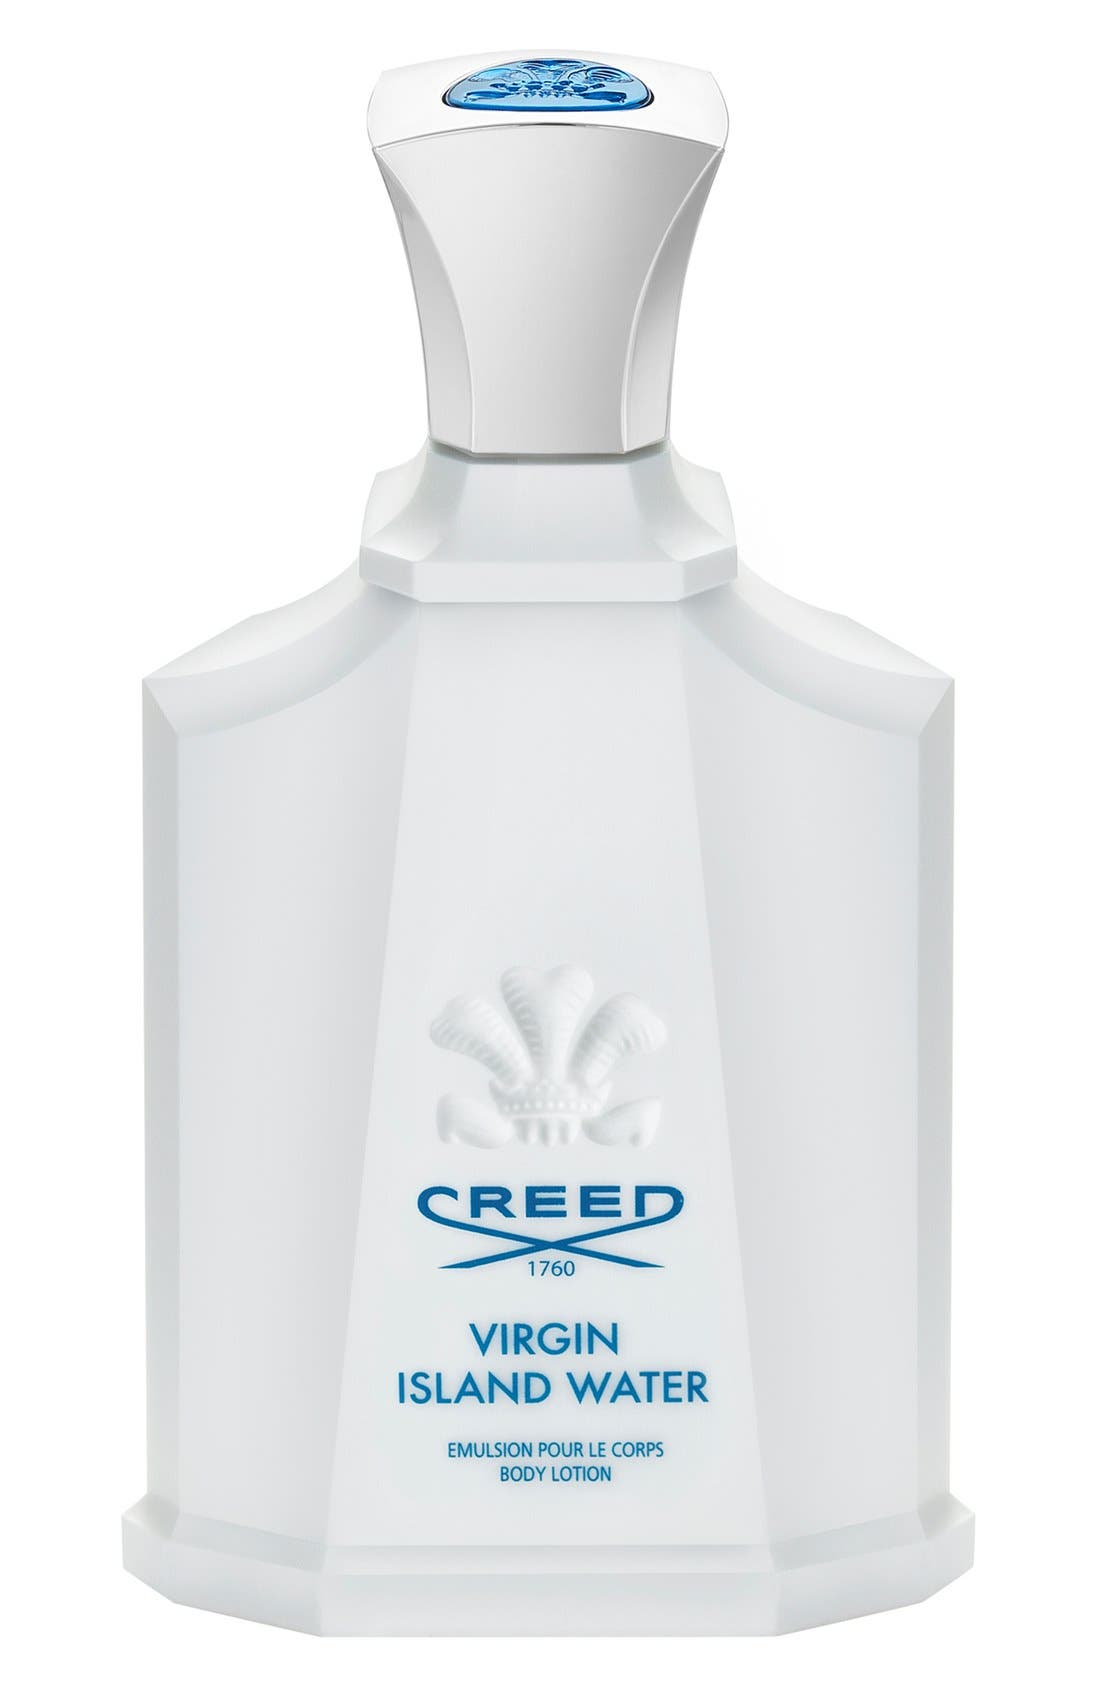 Creed 'Virgin Island Water' Body Lotion